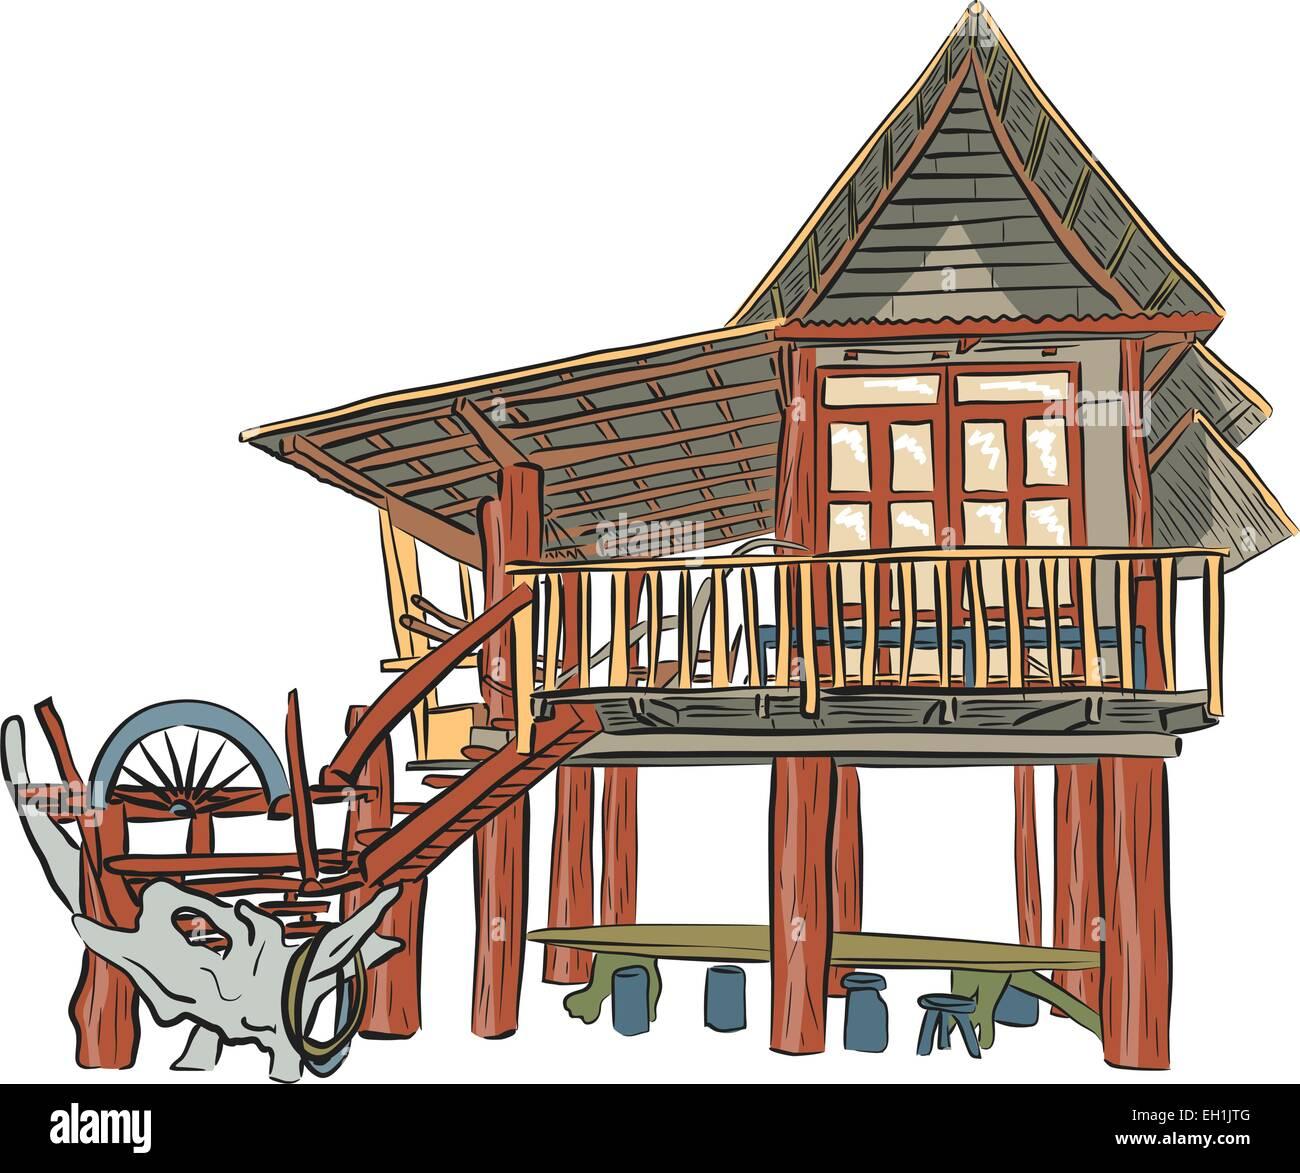 Editable vector sketch of a rustic wooden building - Stock Vector